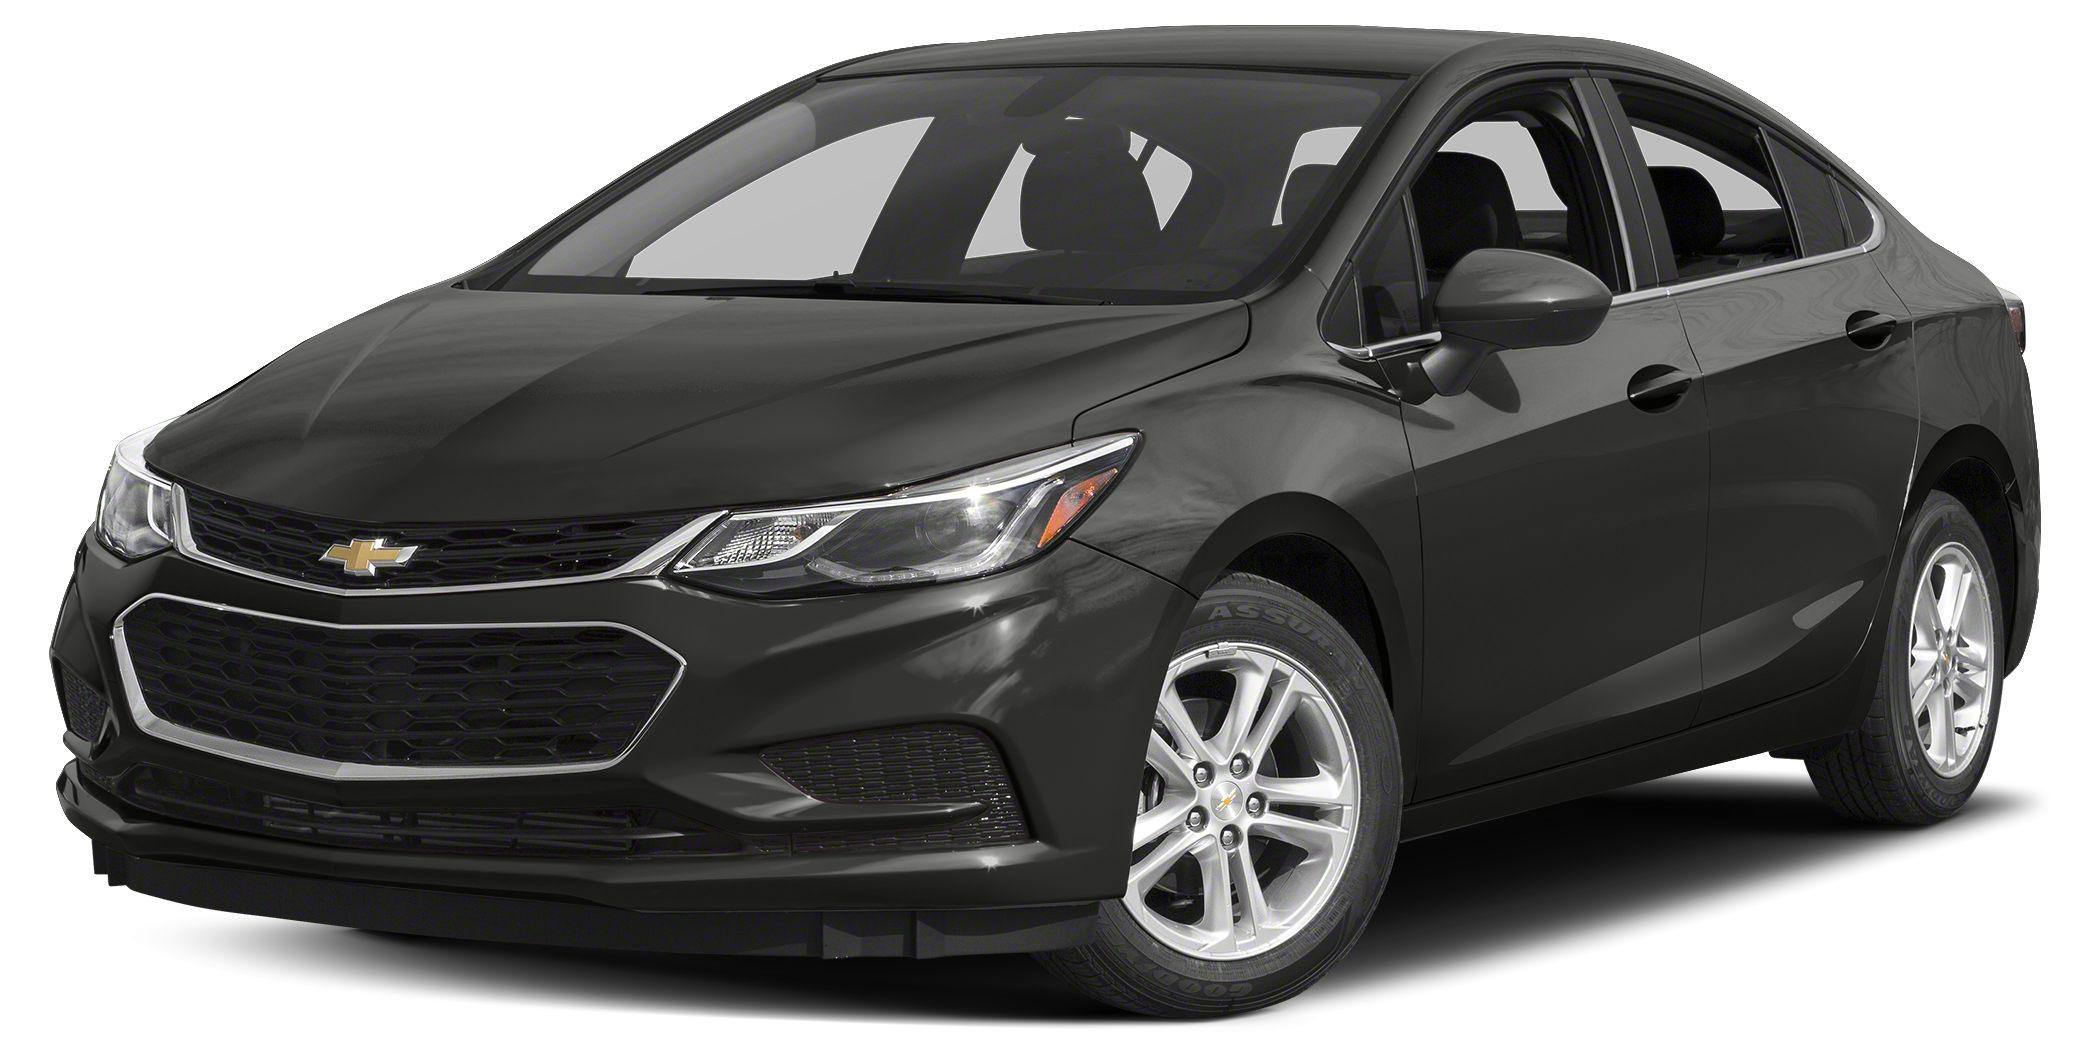 2016 Chevrolet Cruze LT Sunroof Heated Seats Alloy Wheels SUNROOF PACKAGE Turbo Onboard Commu